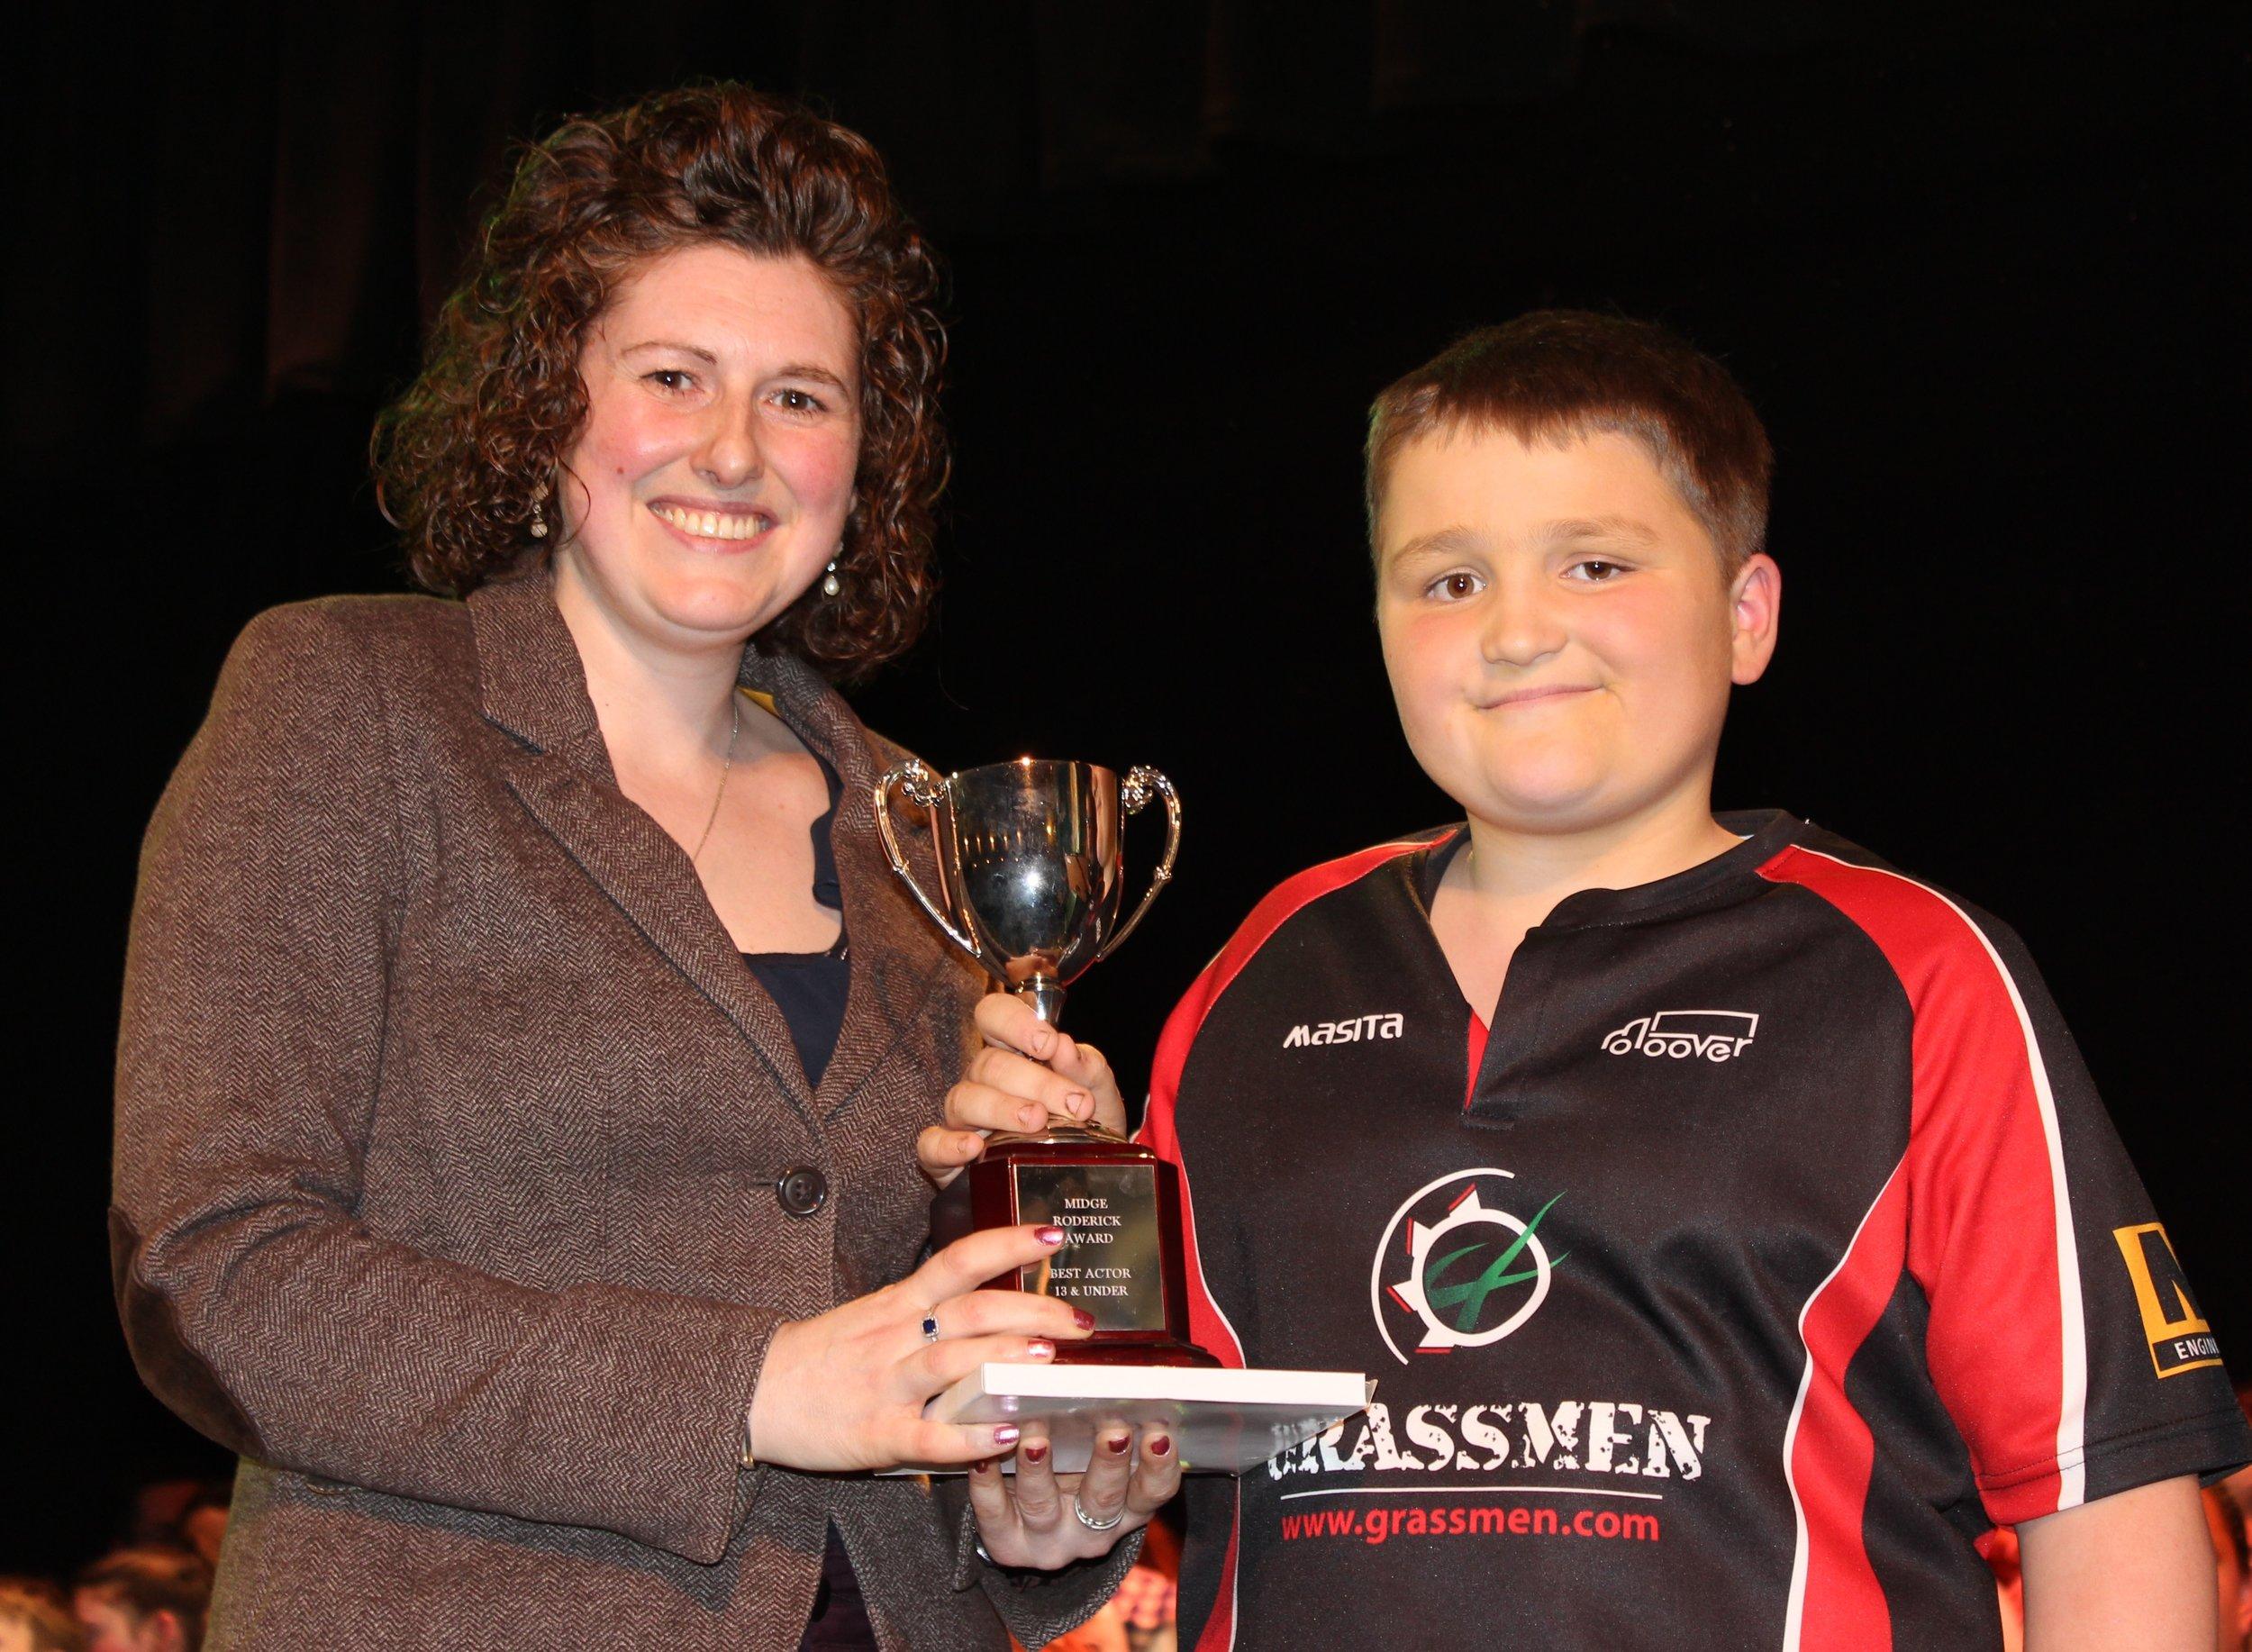 William Goodwin Edwards, Llanbadarn Fynydd YFC - MIdge Roderick Awards for Best Actor 13 Years and Under.